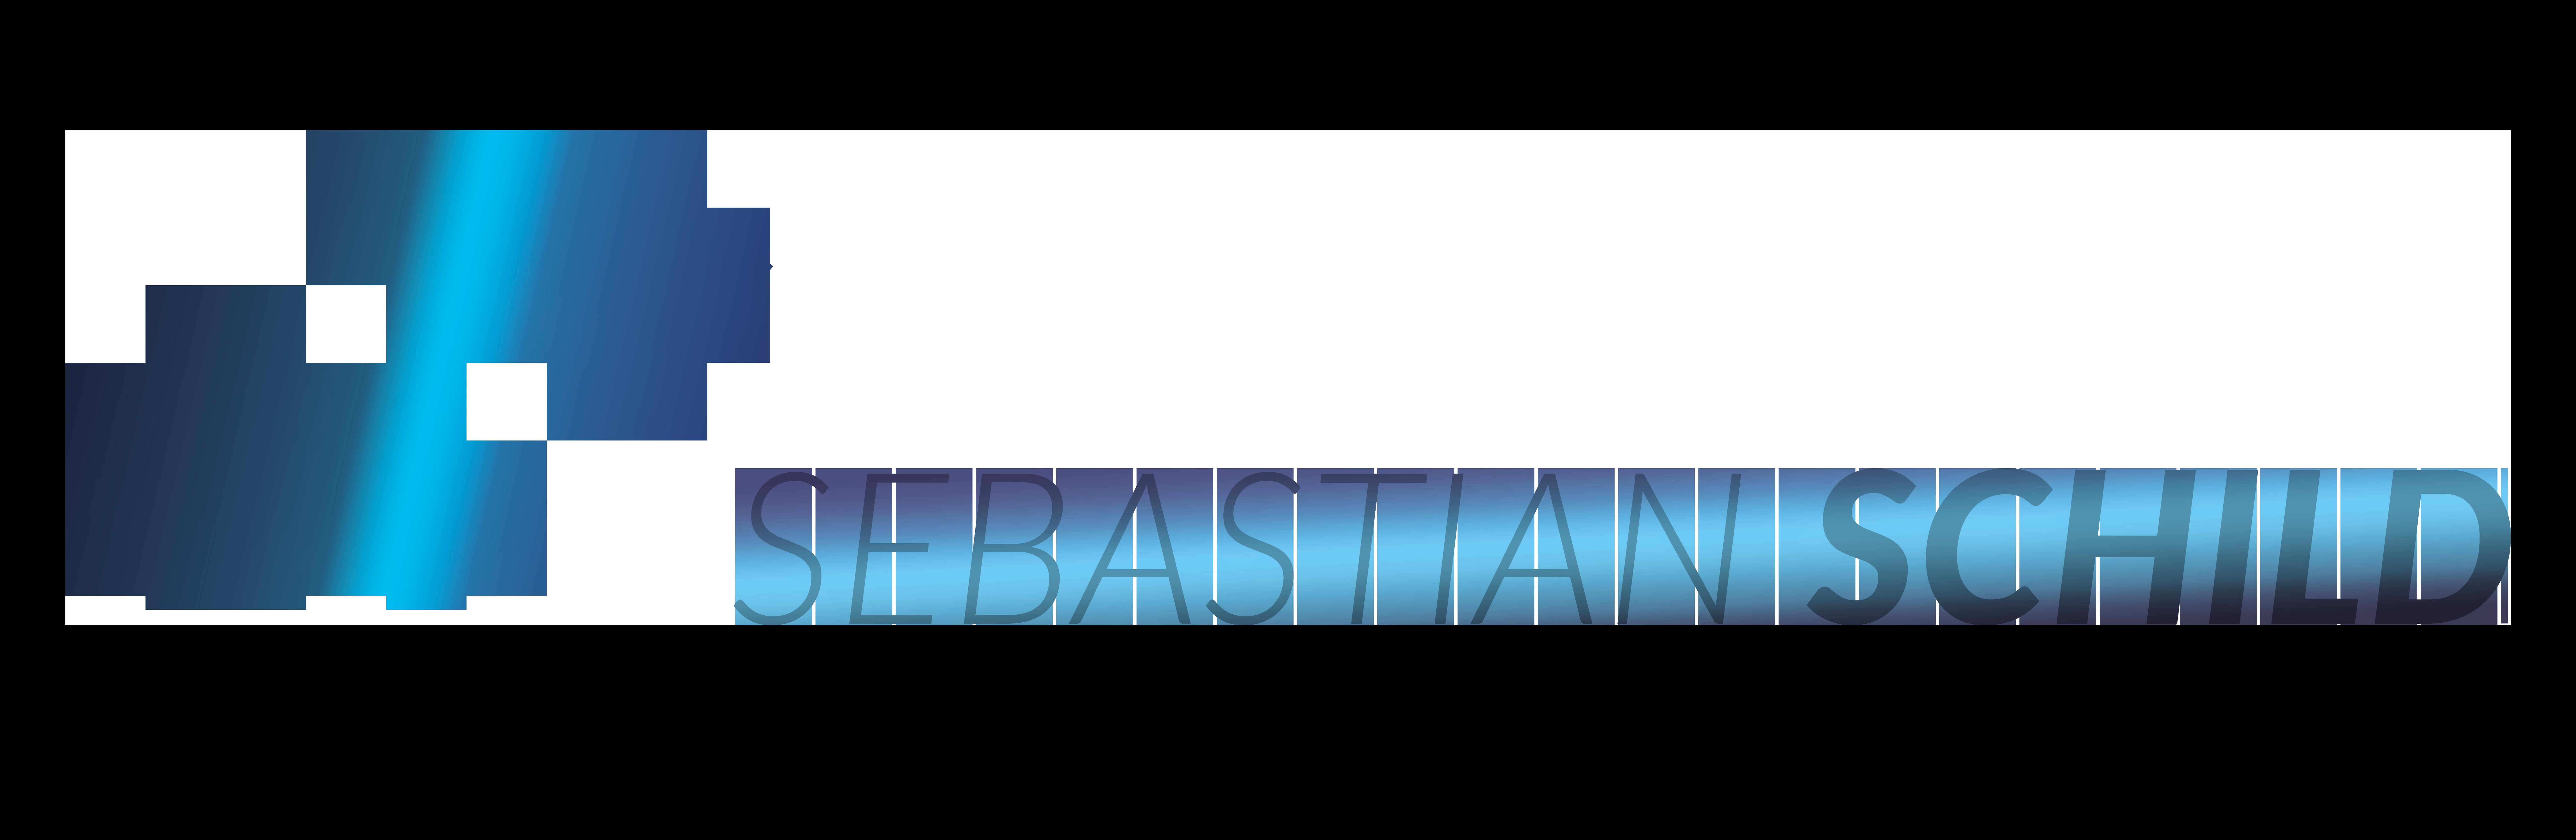 SebastianPSchild.com